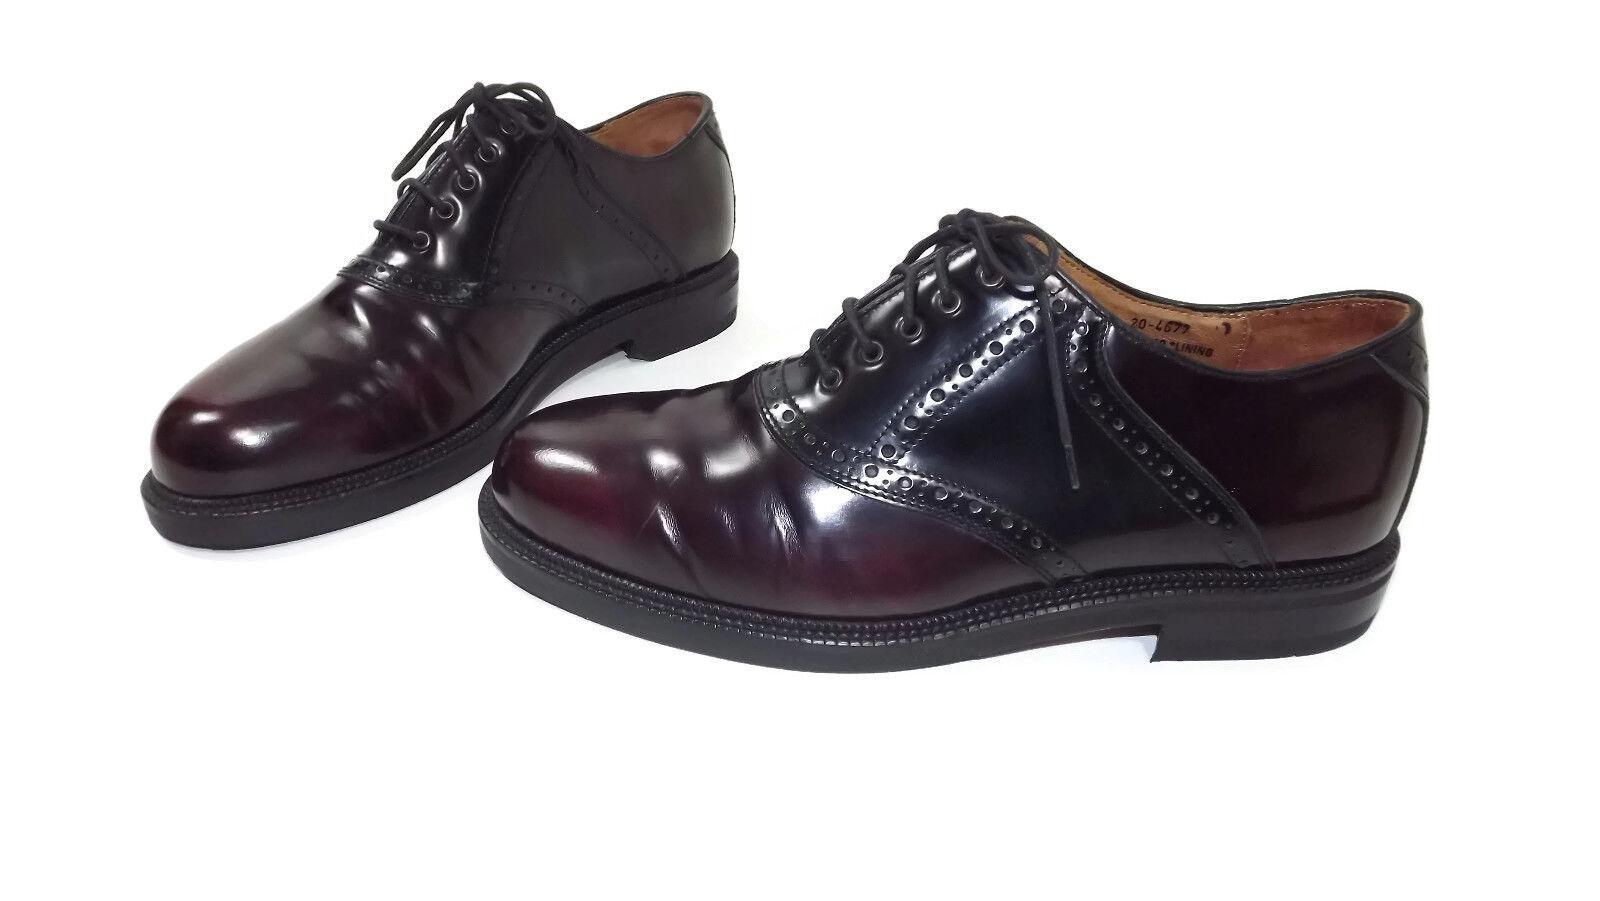 JOHNSTON & MURPHY Passport Mens shoes Size 9 M Black Brown Oxfords MD   145